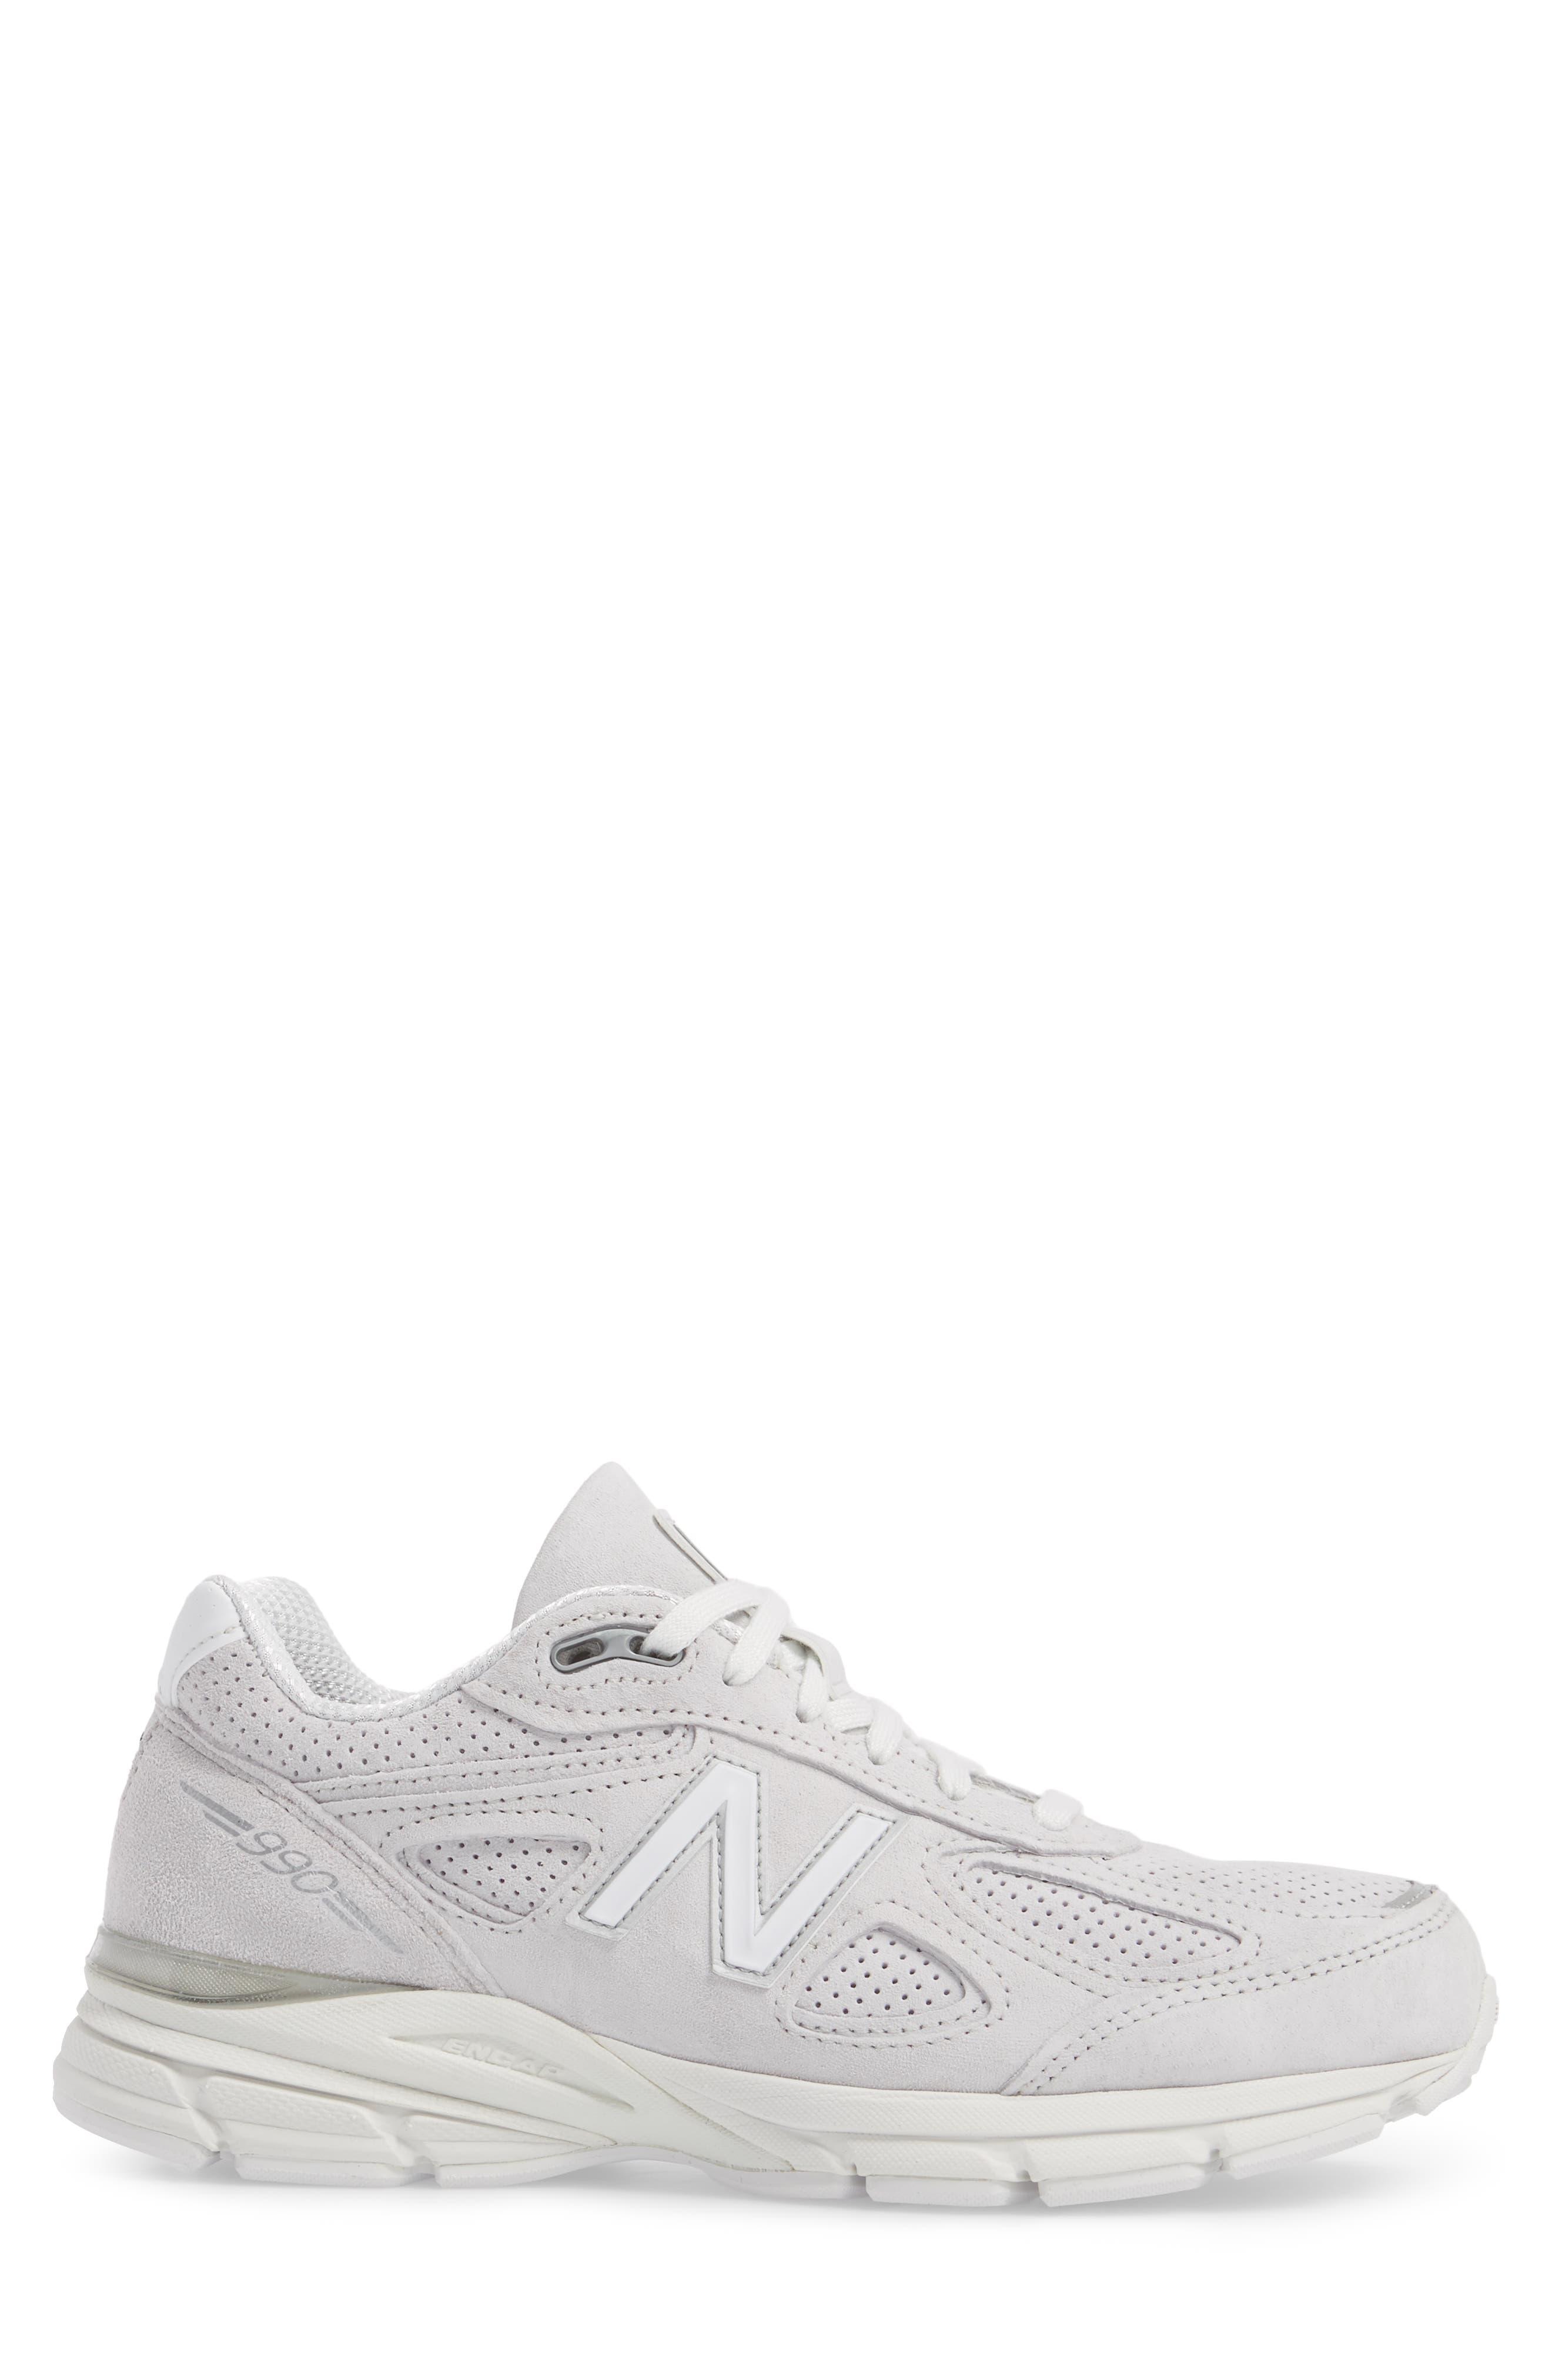 990v4 Perforated Sneaker,                             Alternate thumbnail 3, color,                             Arctic Fox